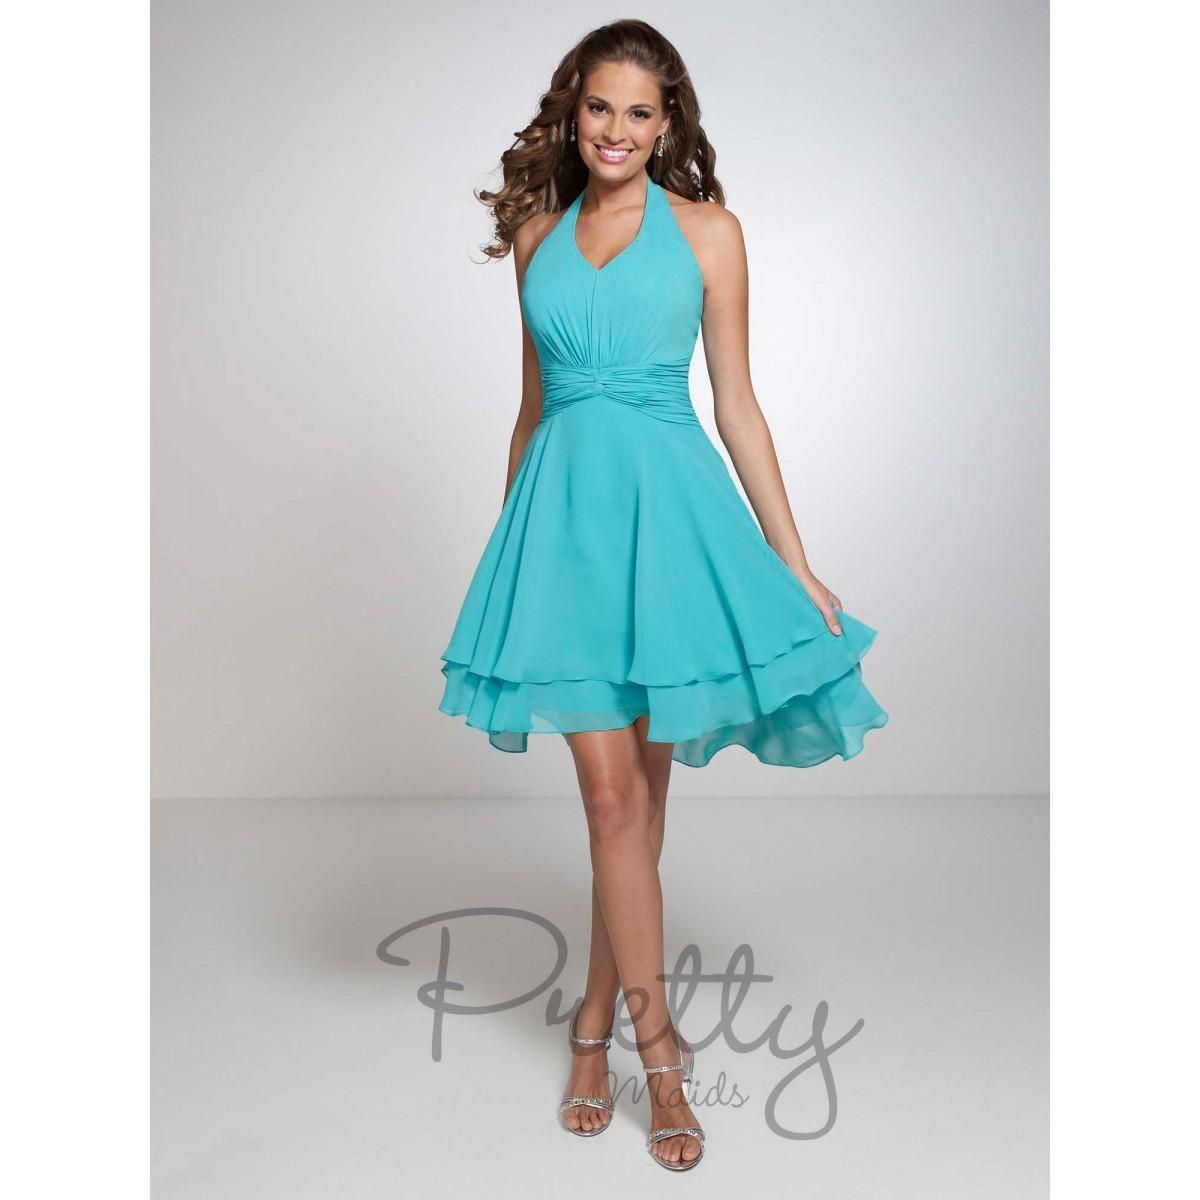 Turquoise halter chiffon short bridesmaid dresses mini ruffles